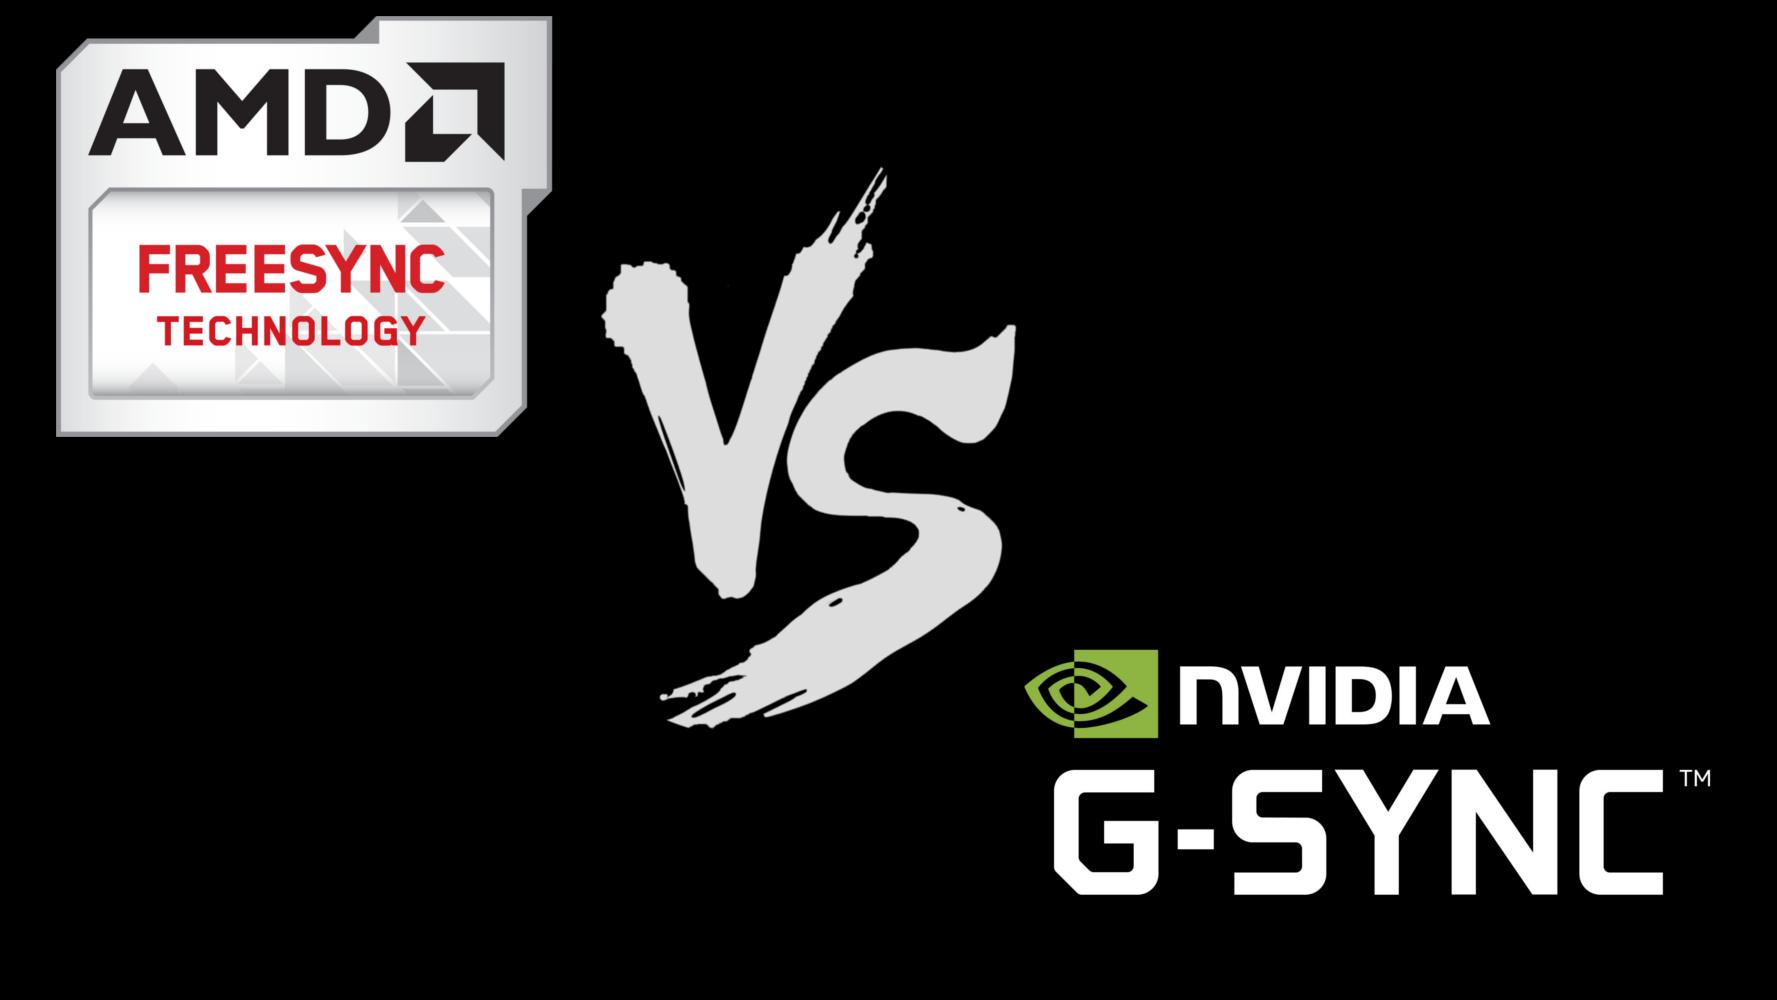 قريباً ستستطيع تشغيل شاشات G-Sync مع بطاقات AMD !! كرت شاشة